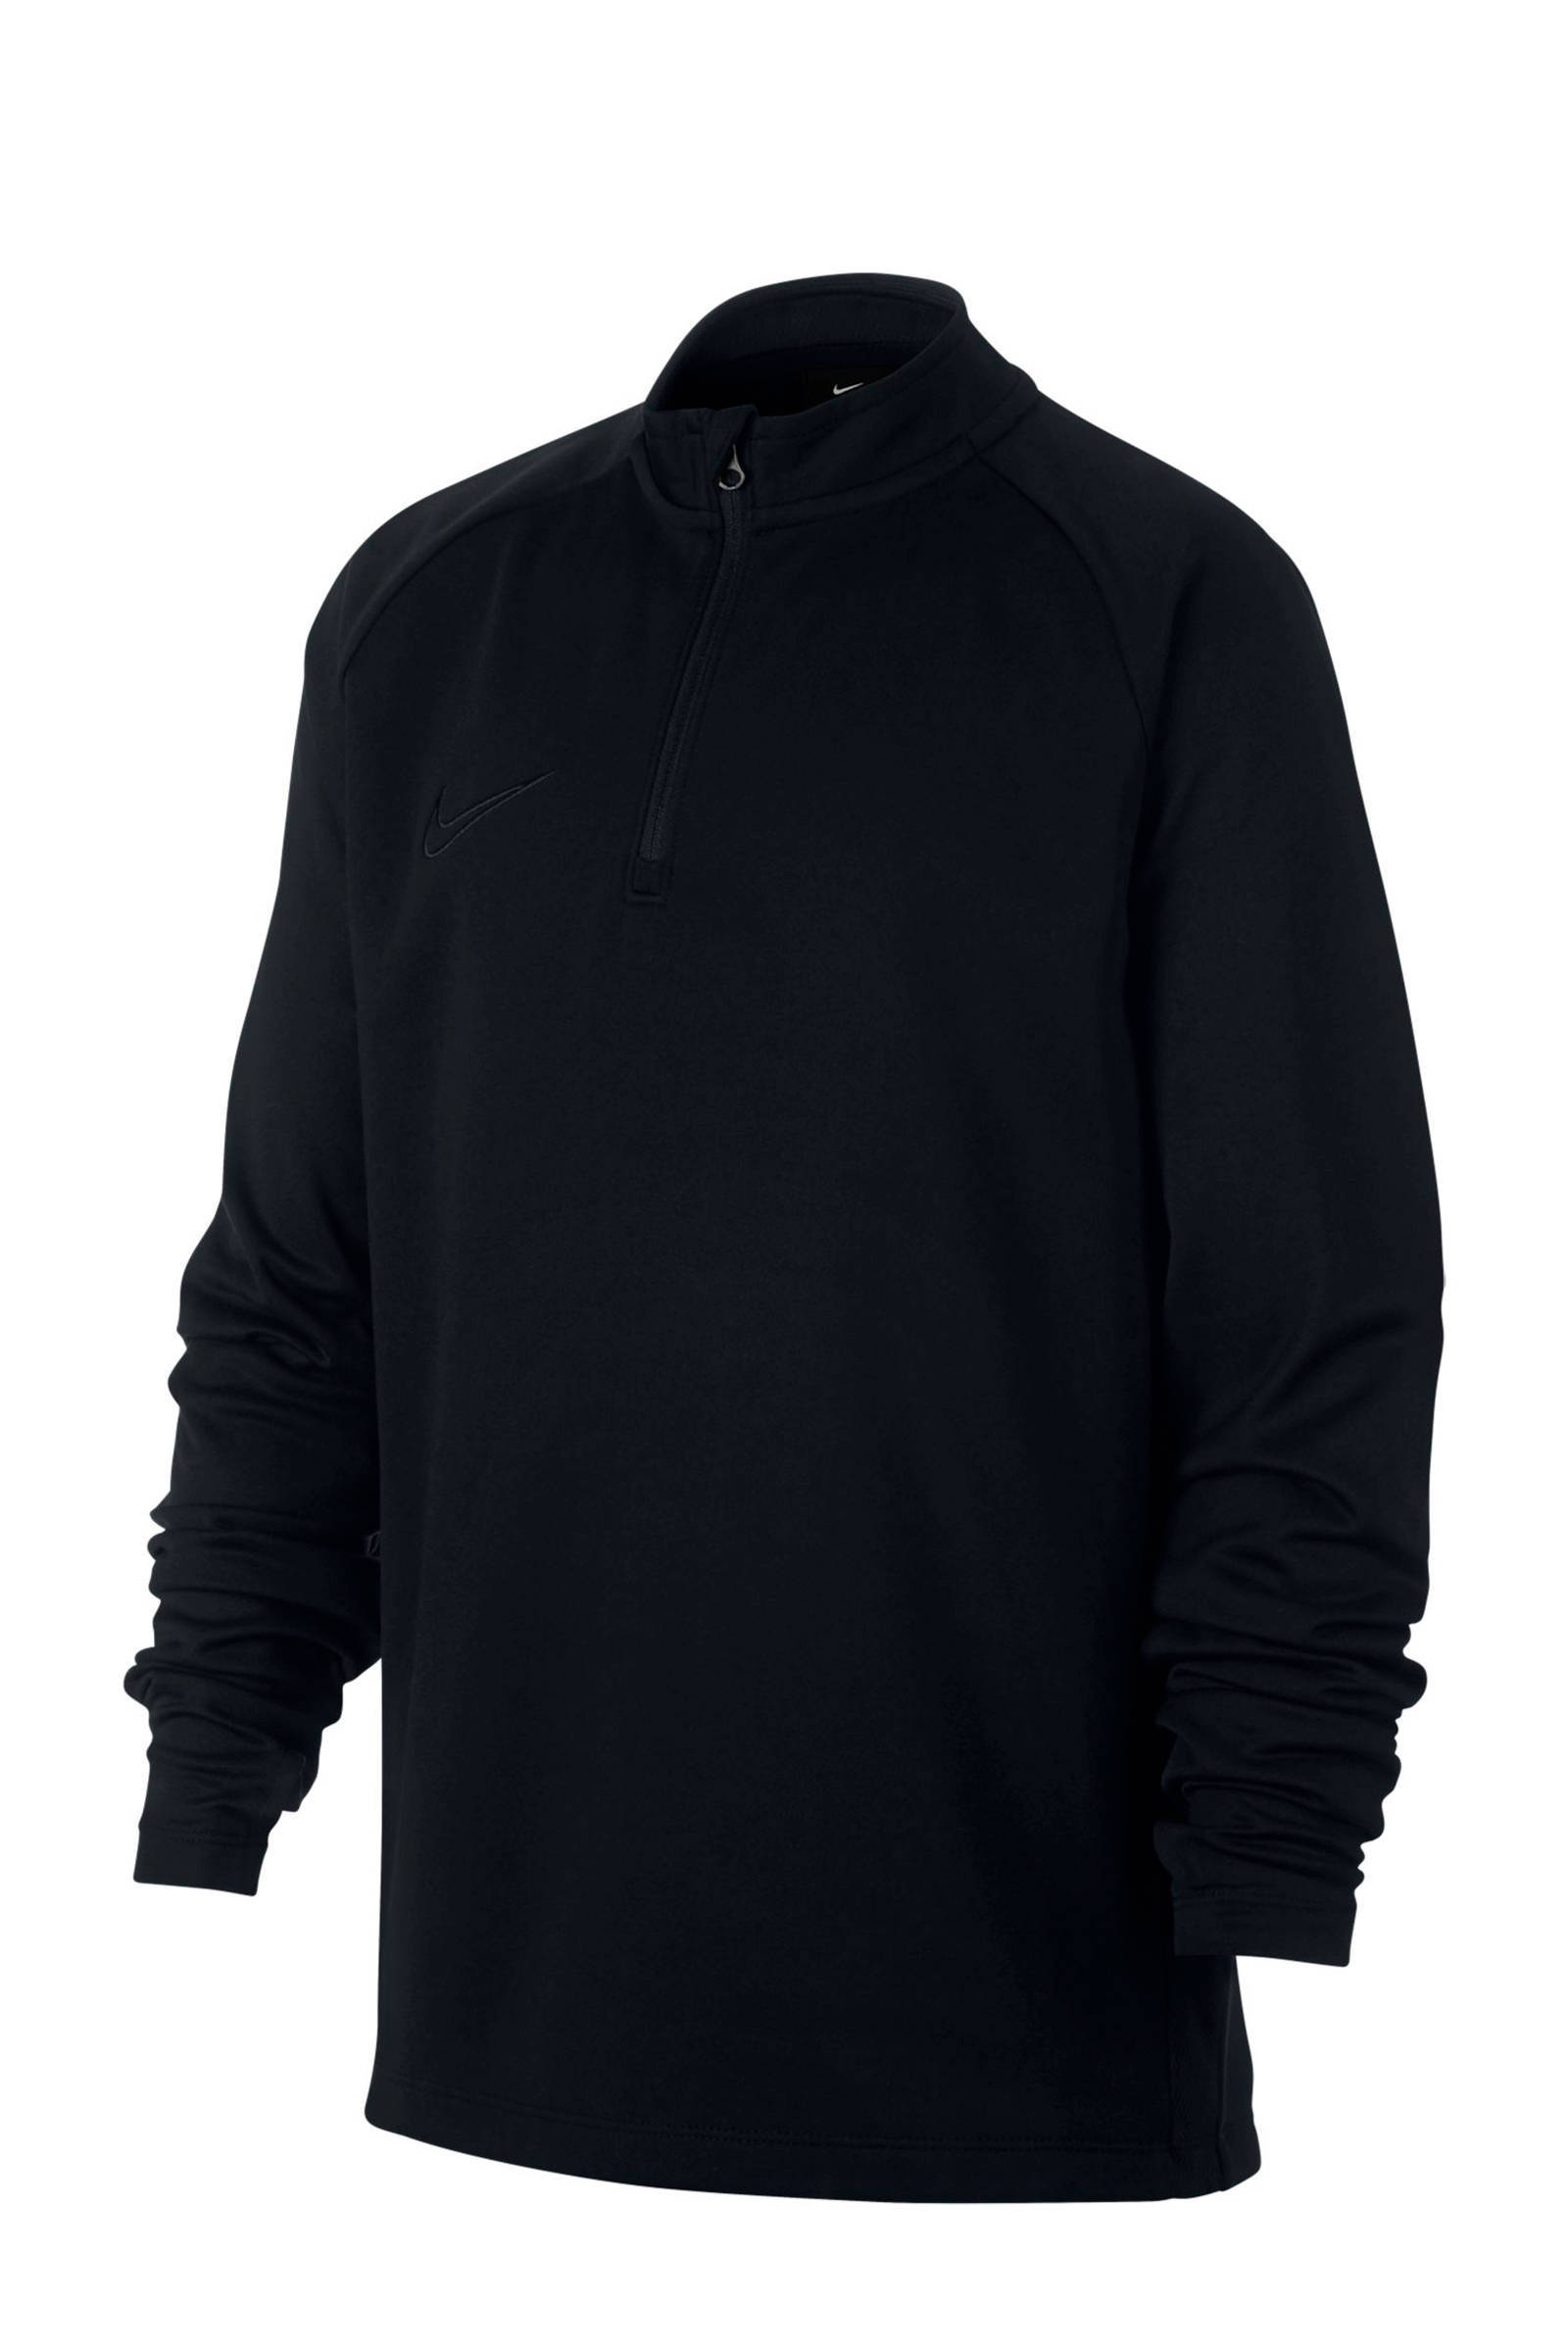 Nike voetbalshirt zwart - maat 158/170